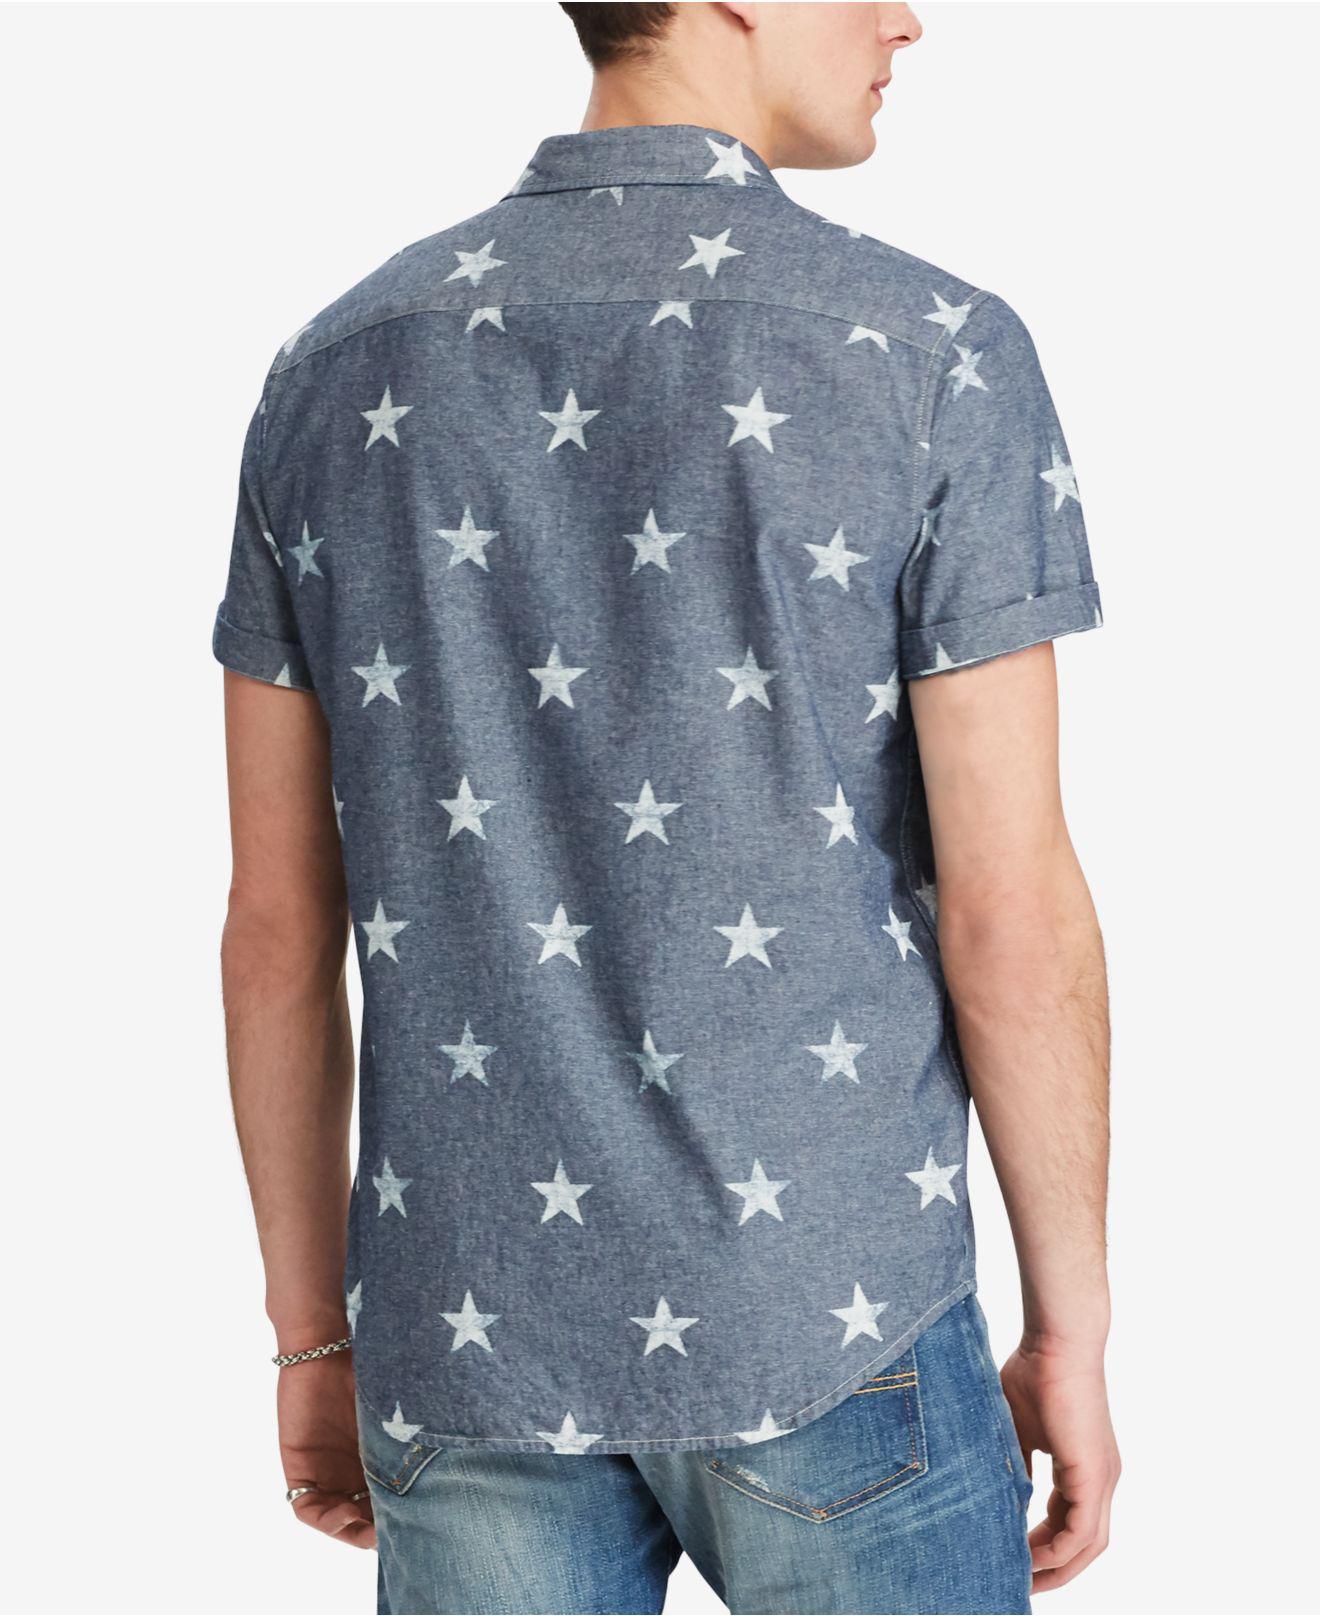 342b5da6f Denim & Supply Ralph Lauren Men's Star-print Chambray Shirt in Blue ...